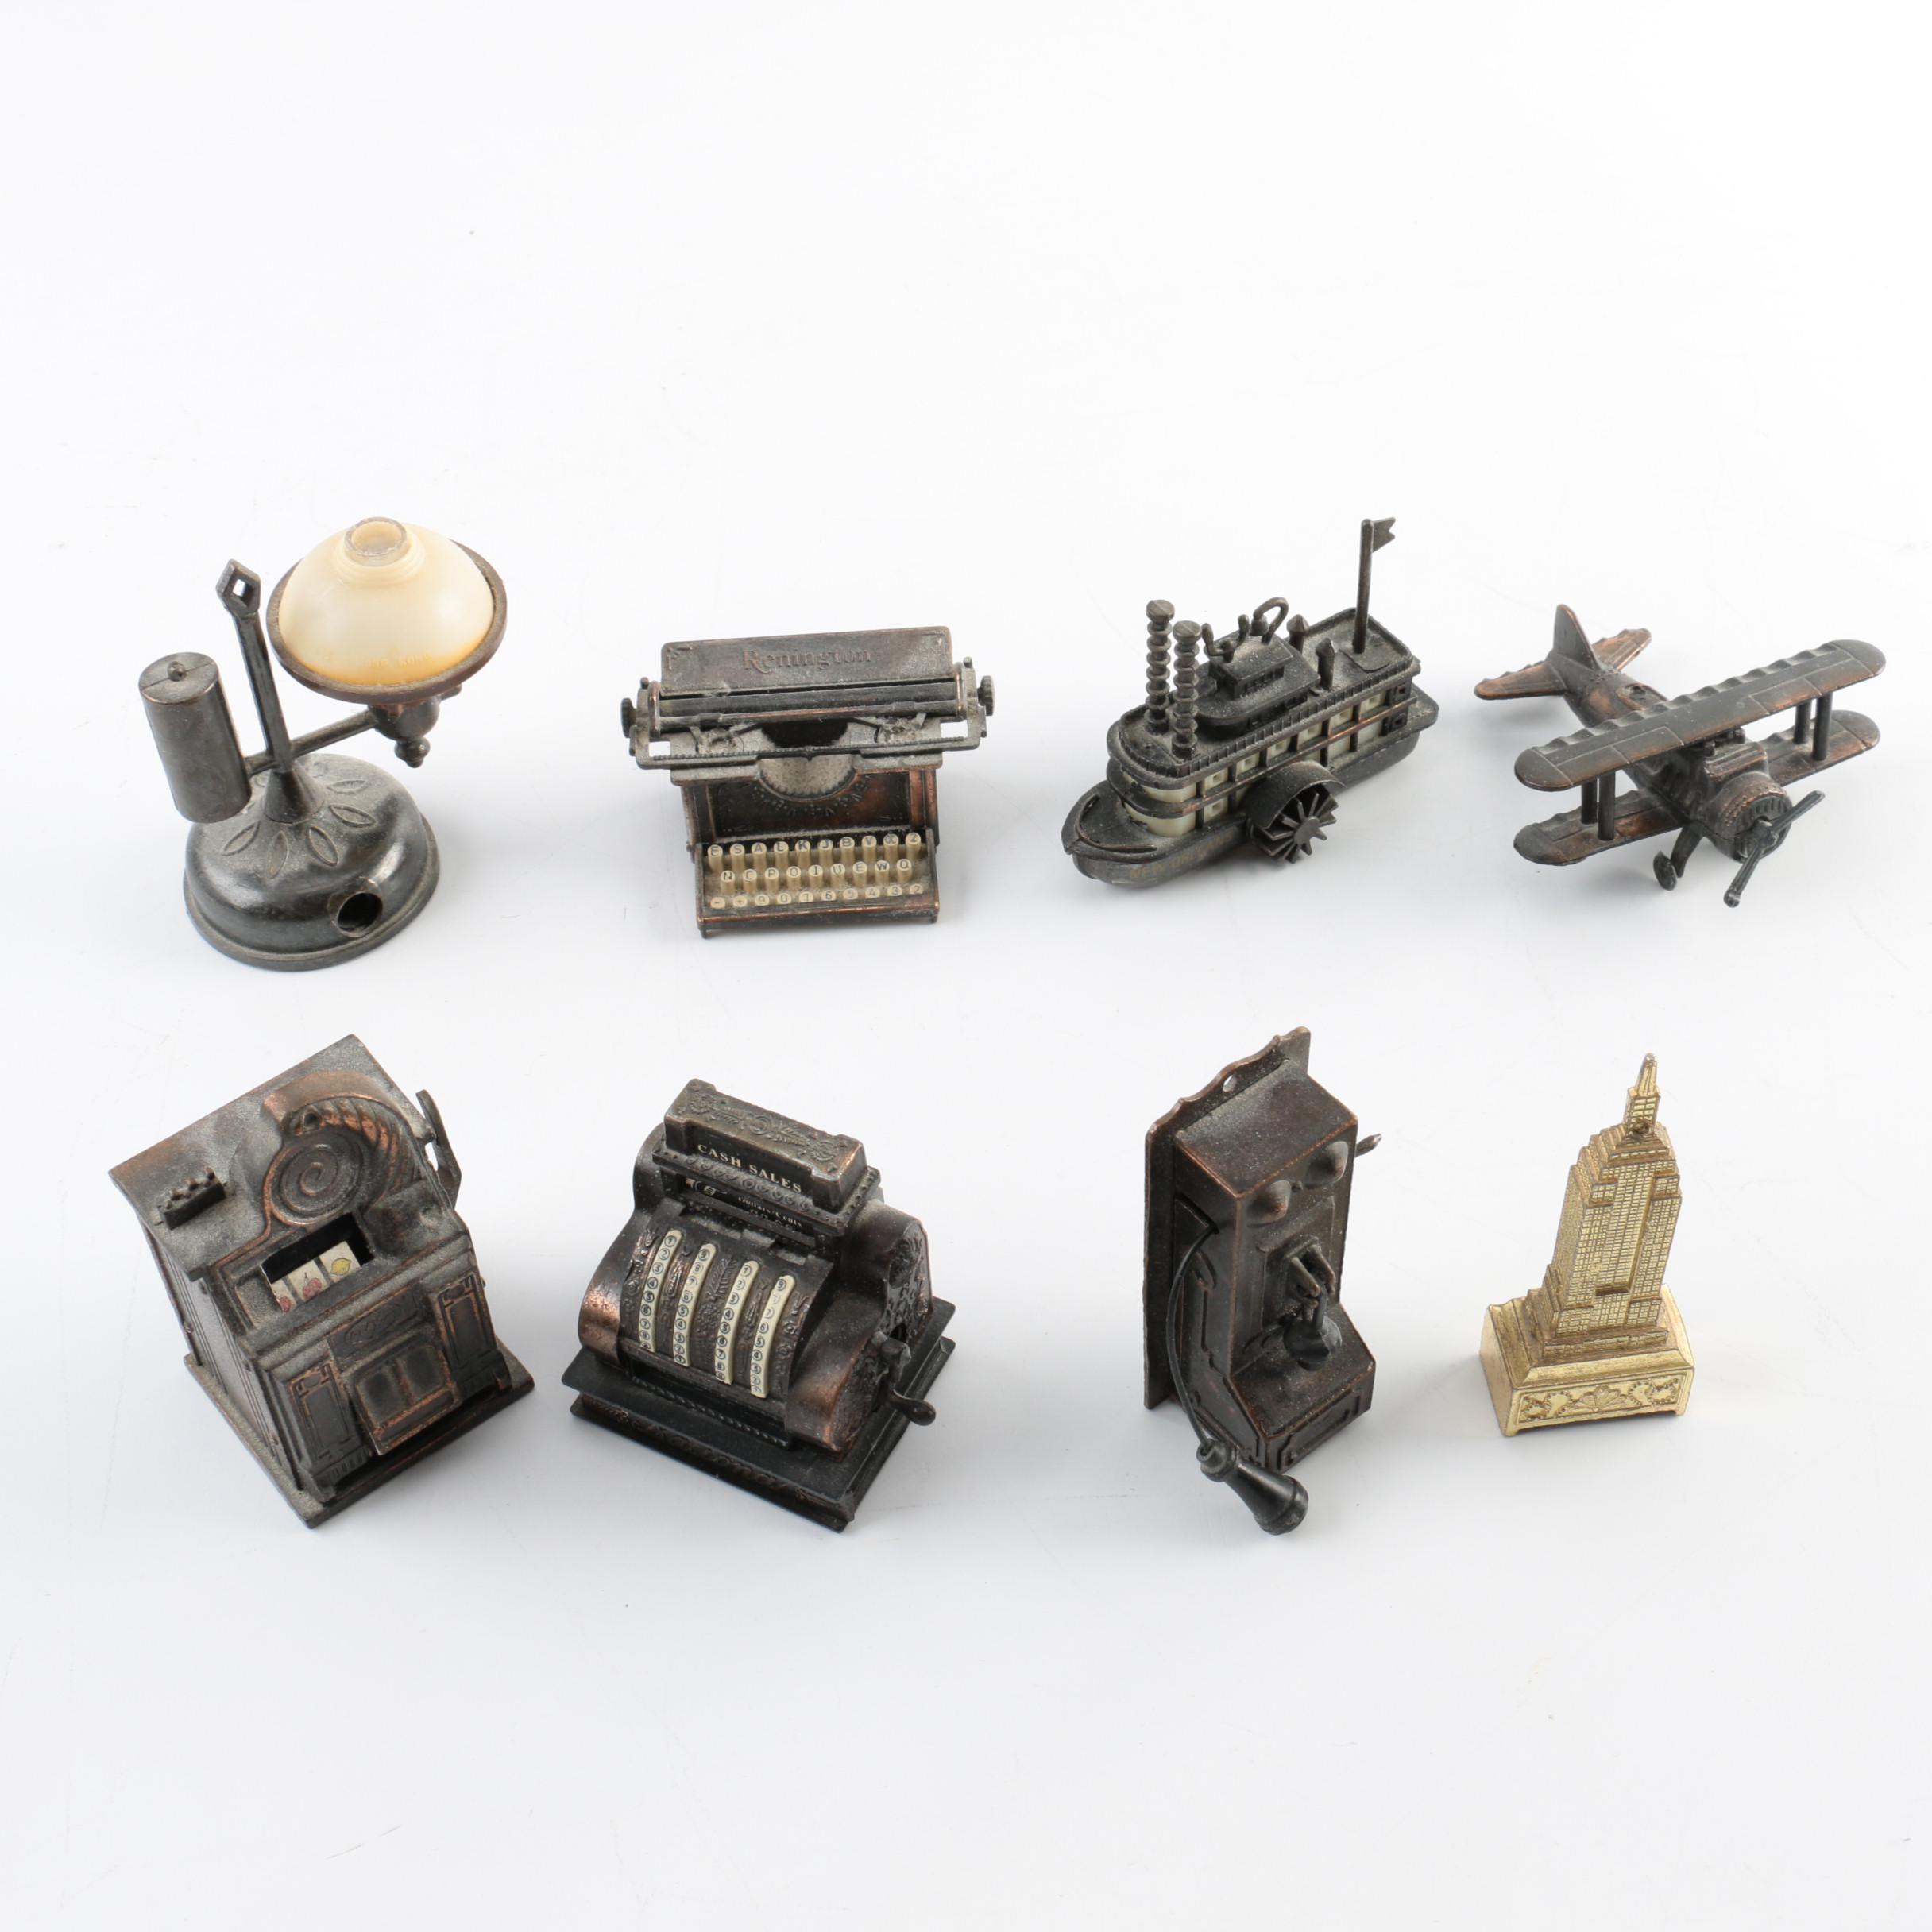 Decorative Pencil Sharpeners